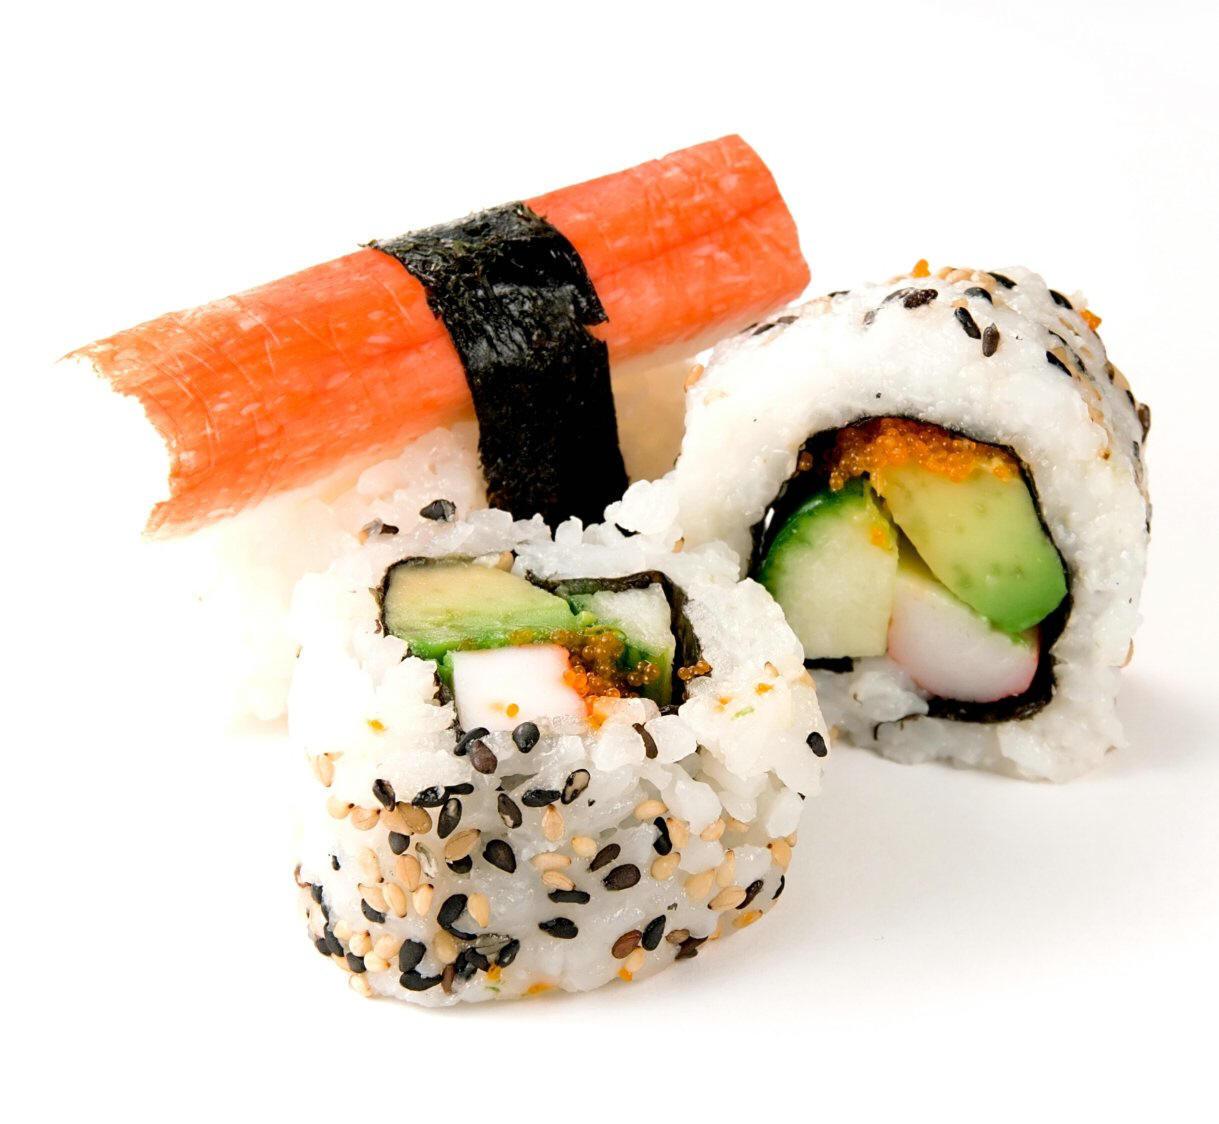 http://4.bp.blogspot.com/_SxYXlFCMt0A/TJIfLlk5YzI/AAAAAAAAABE/lEE-DjG3oNE/s1600/sushi.jpg